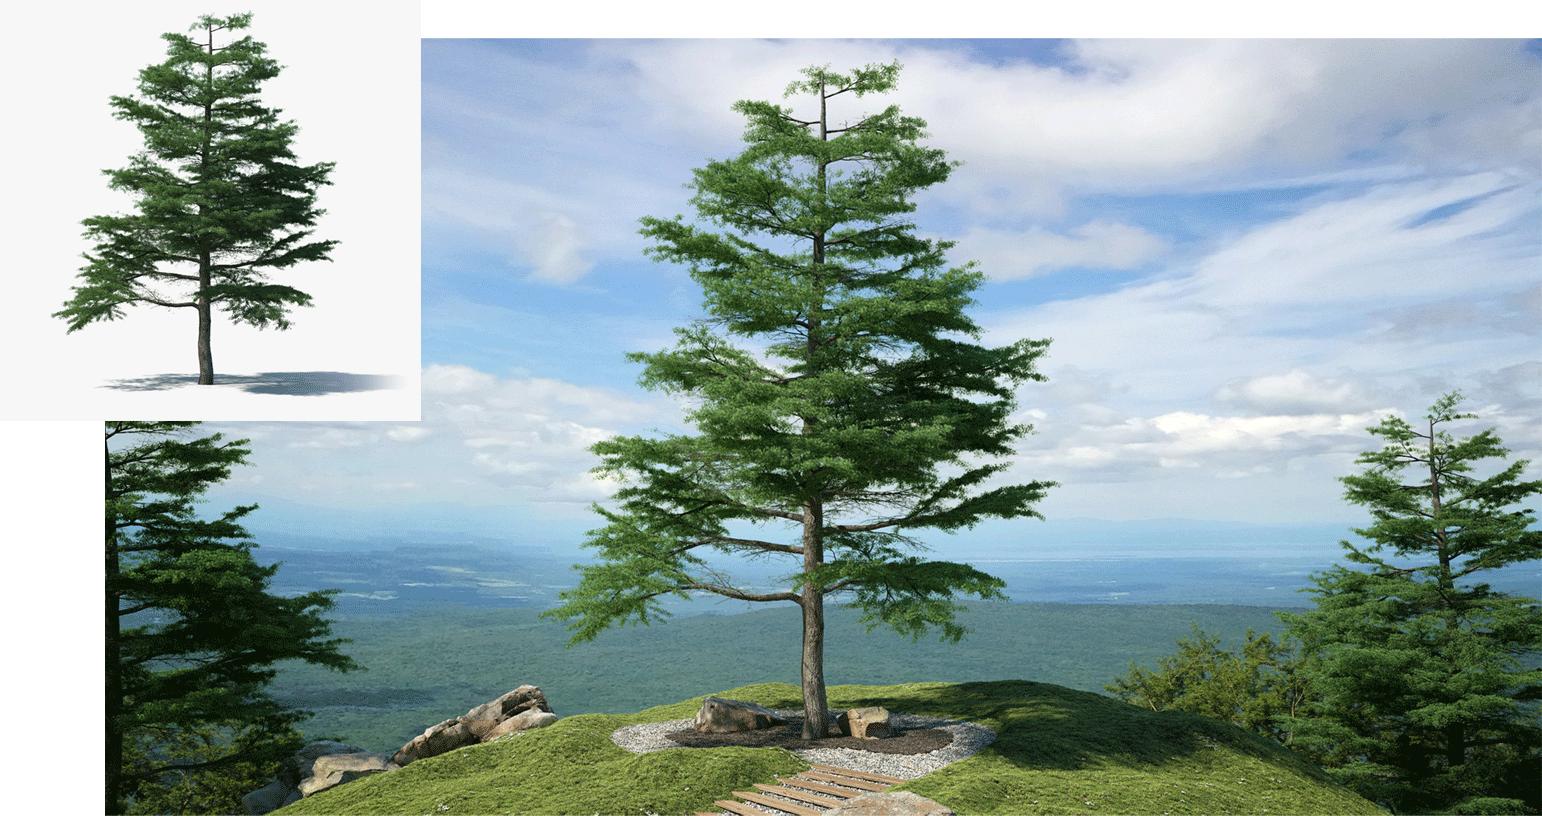 Tree 3D model in context image on TurboSquid